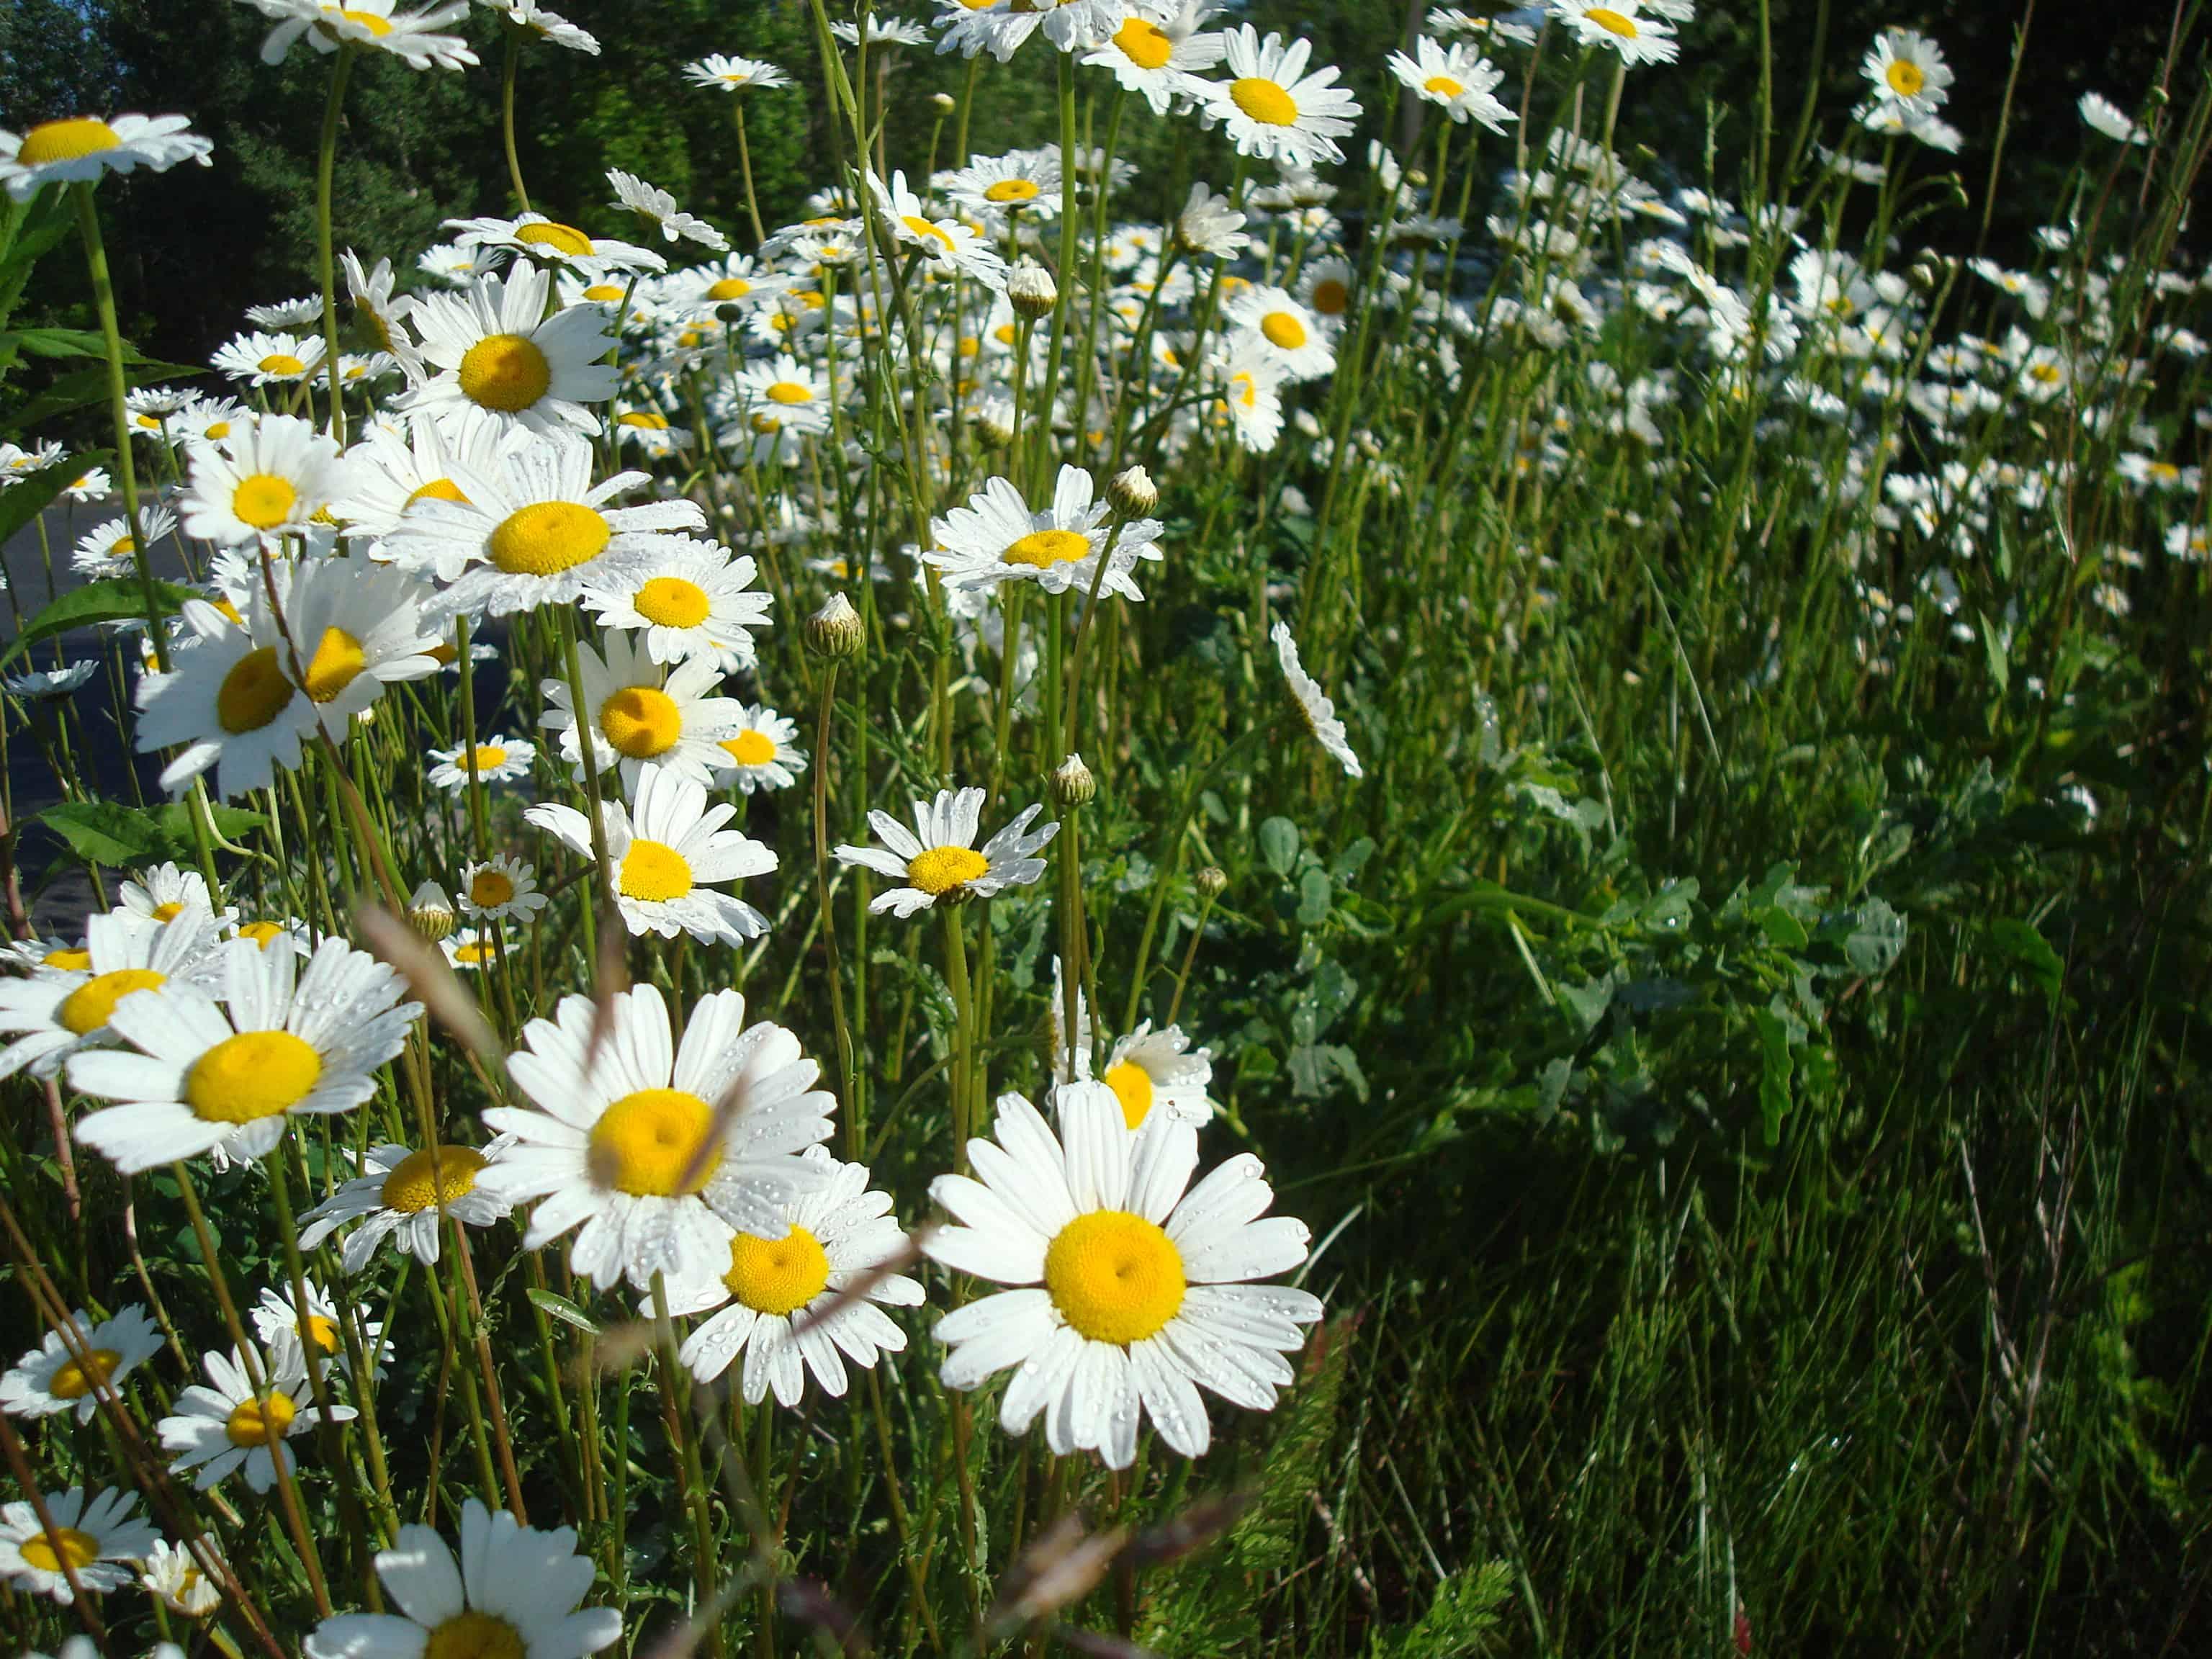 Daises Edible Plant